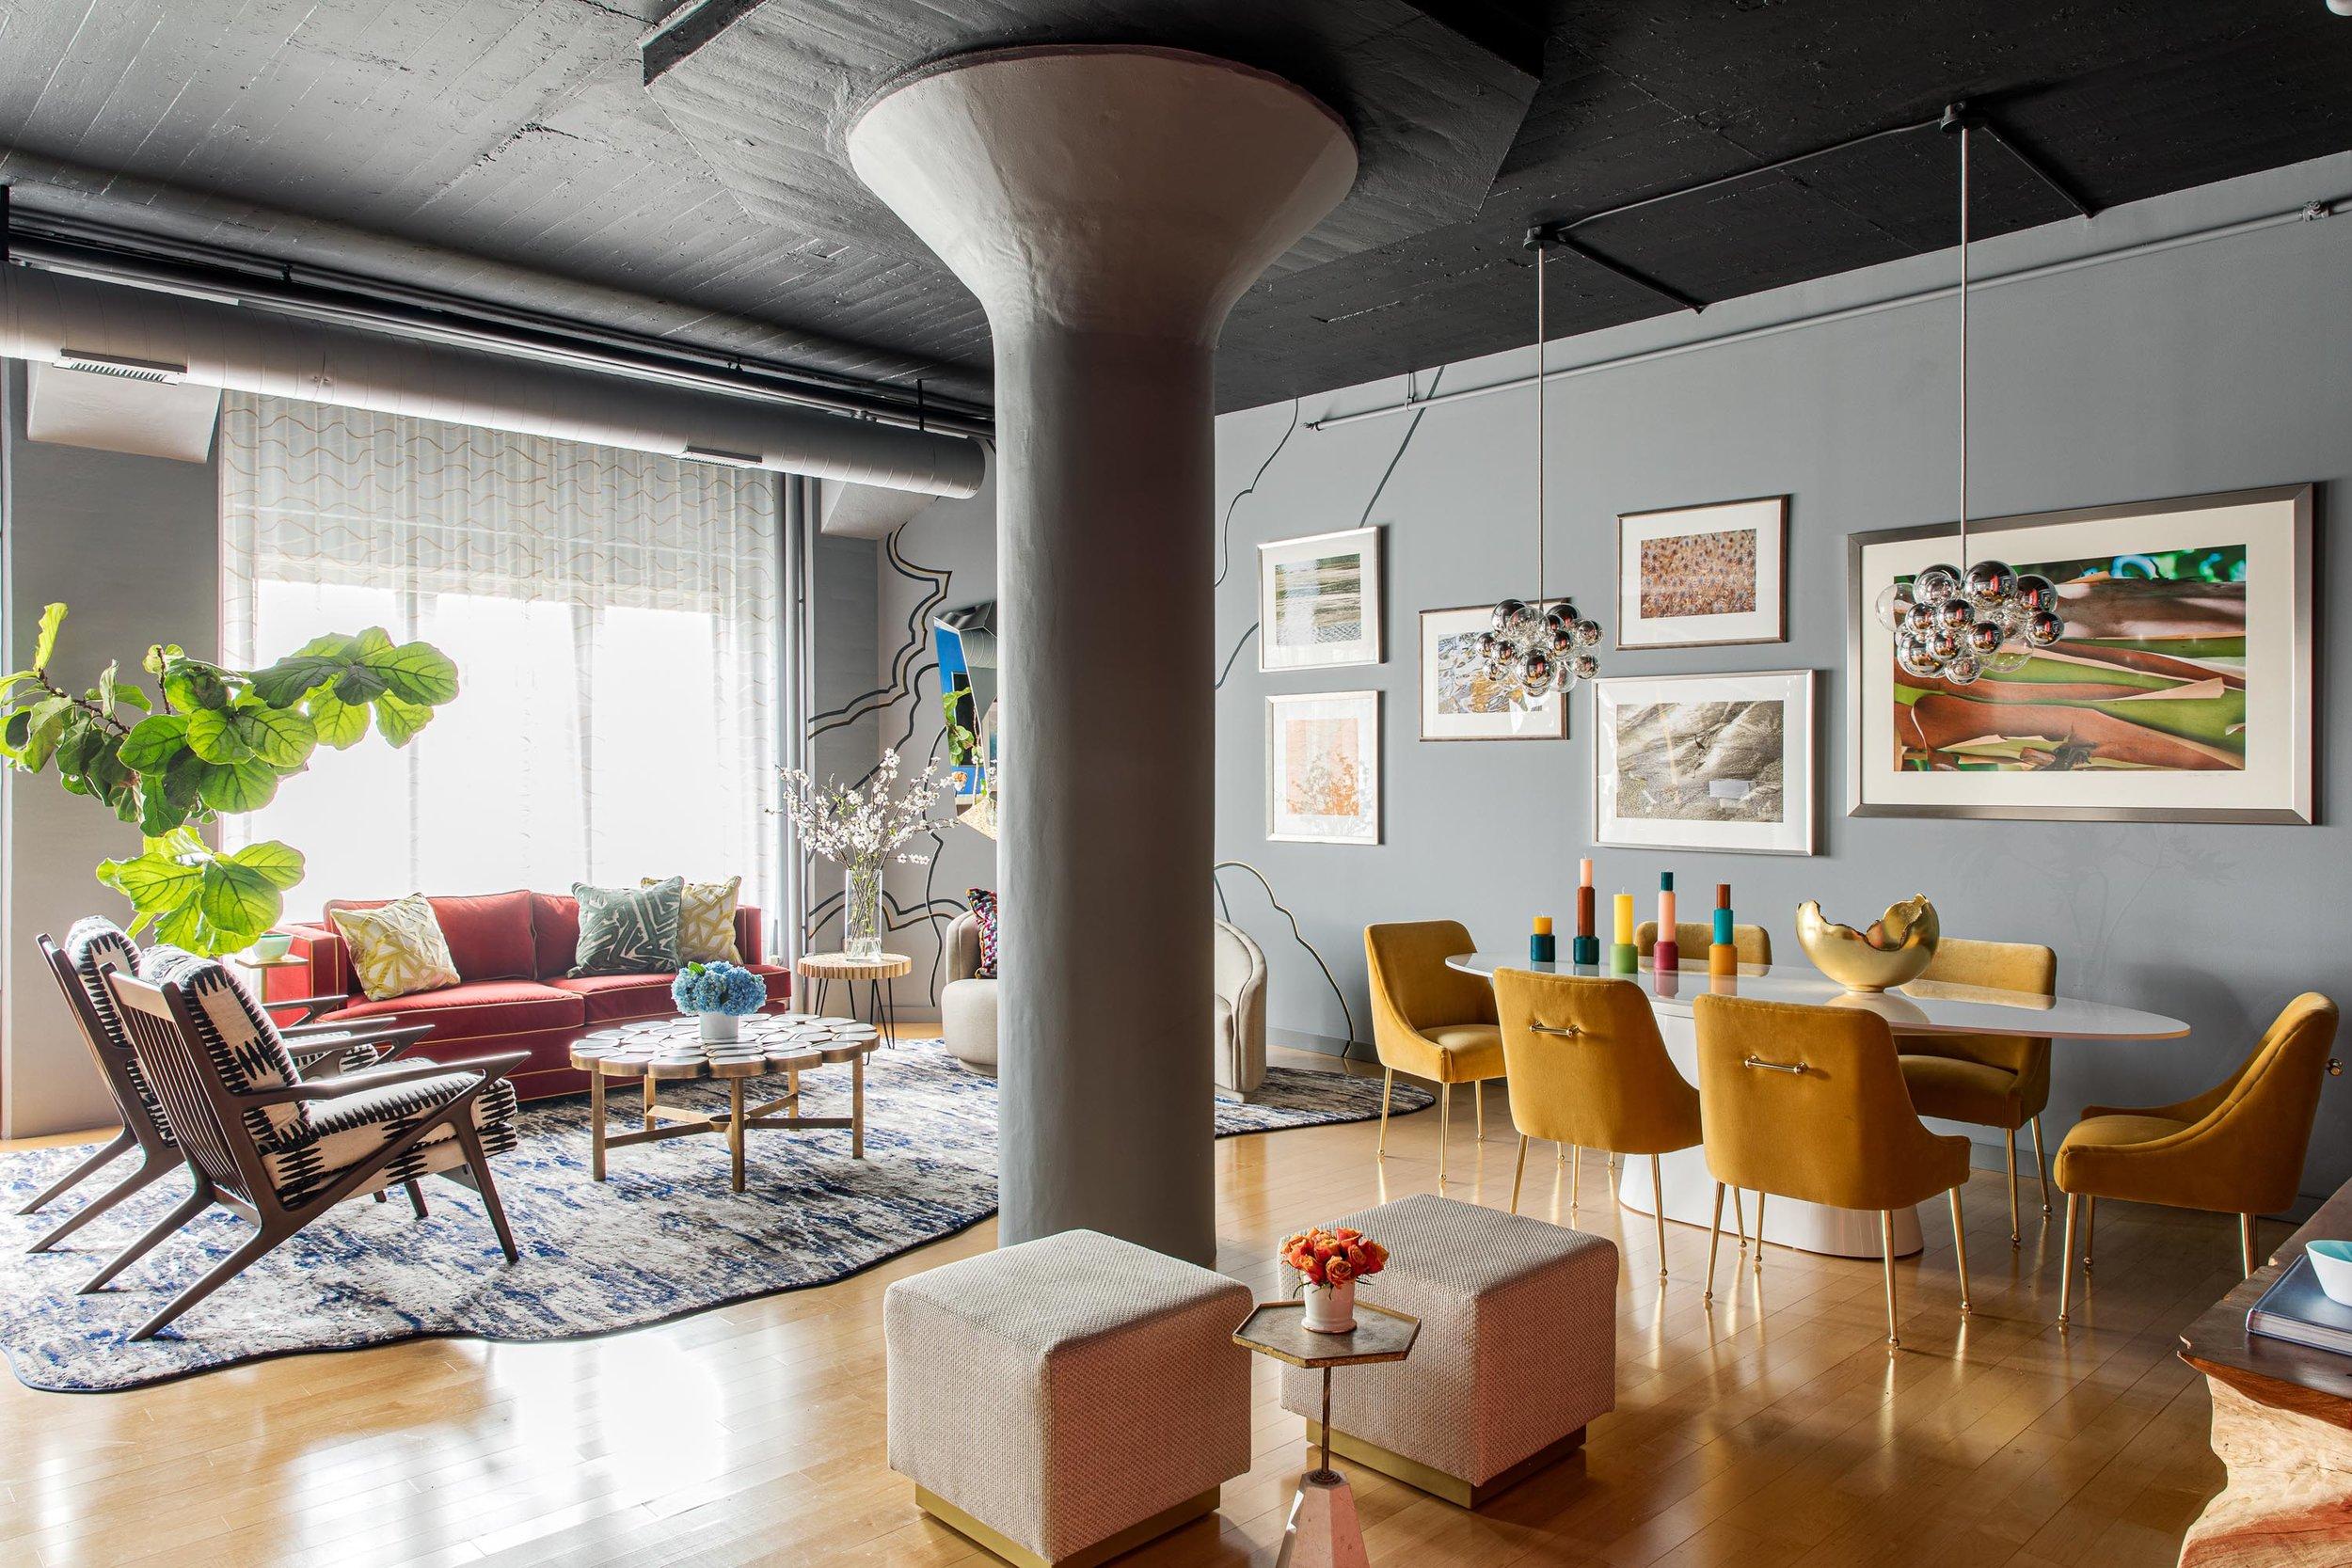 Boston living room loft space interior design by Dane Austin Design